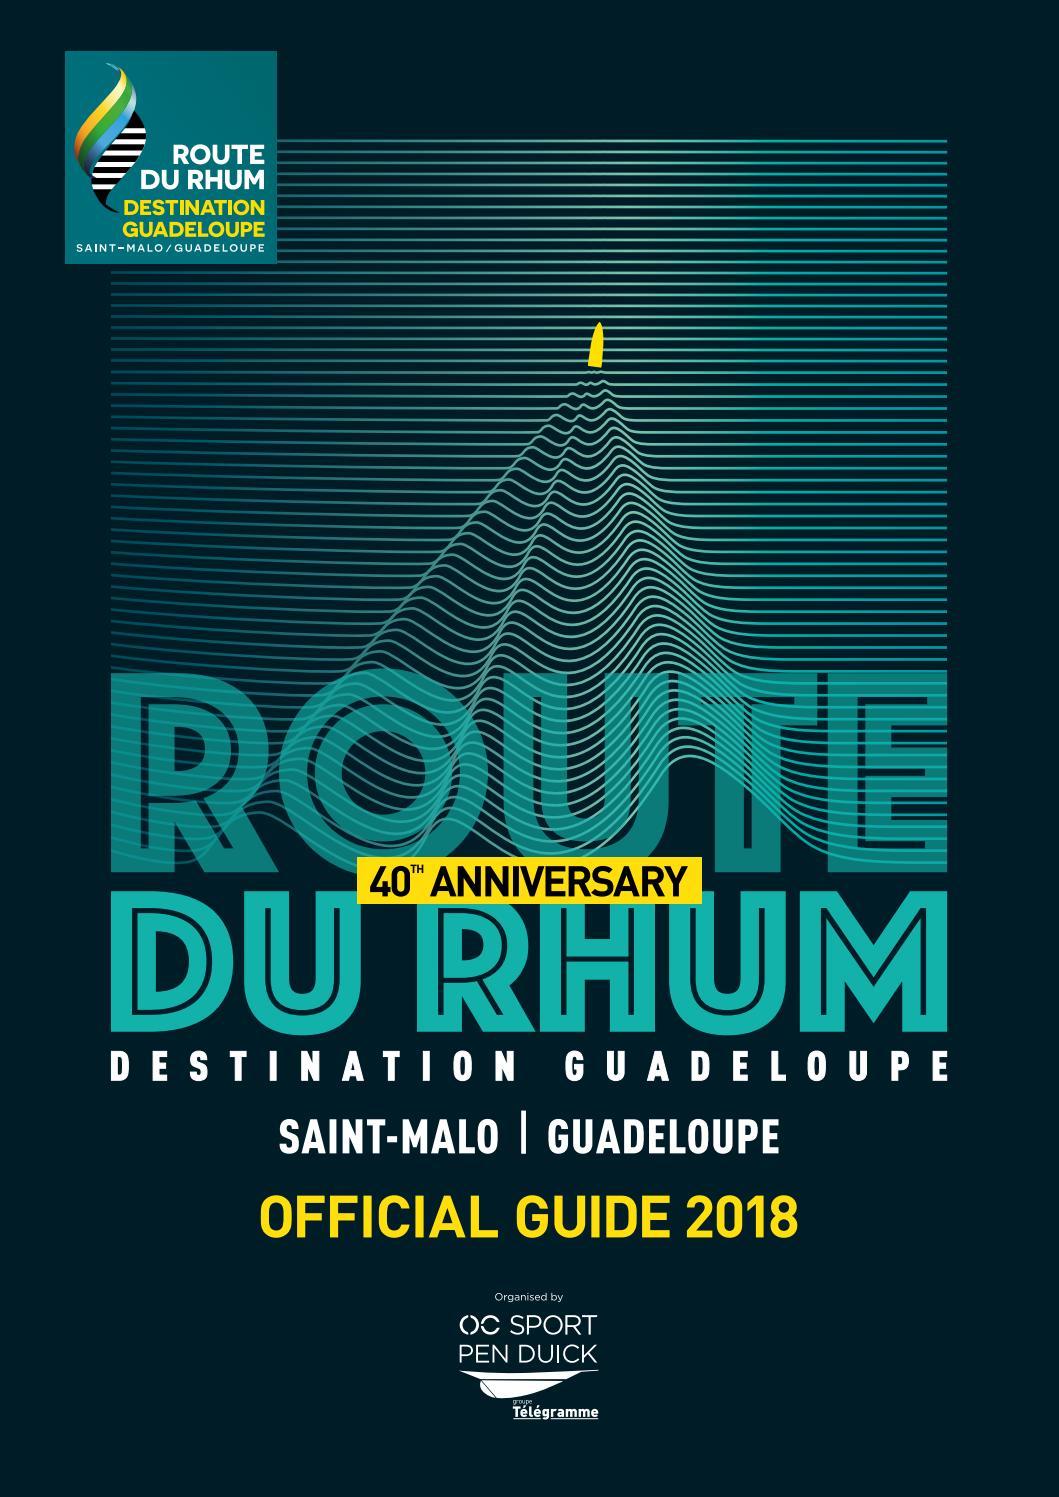 Route du Rhum-Destination Guadeloupe 2018 Guide by OC Sport